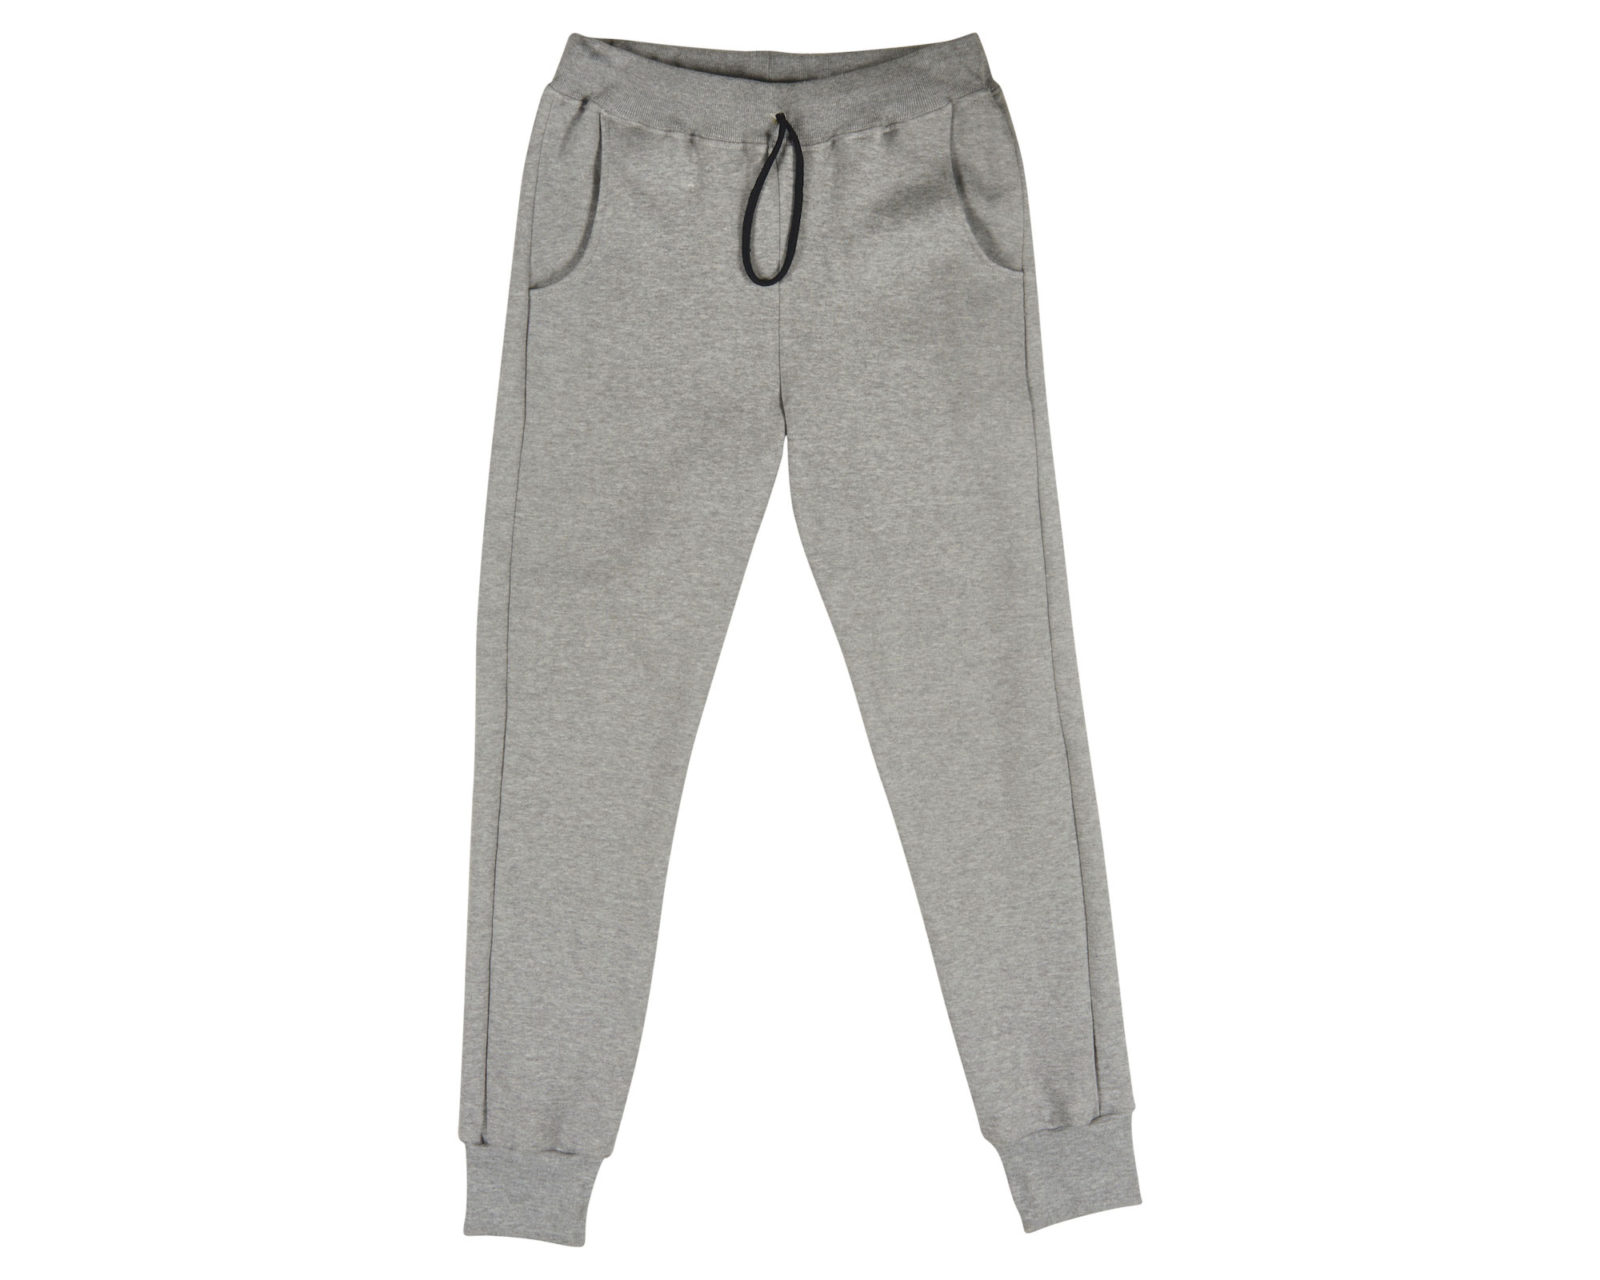 Qualitops Custom Made Mens Track Pant Polycotton Australian made clothing